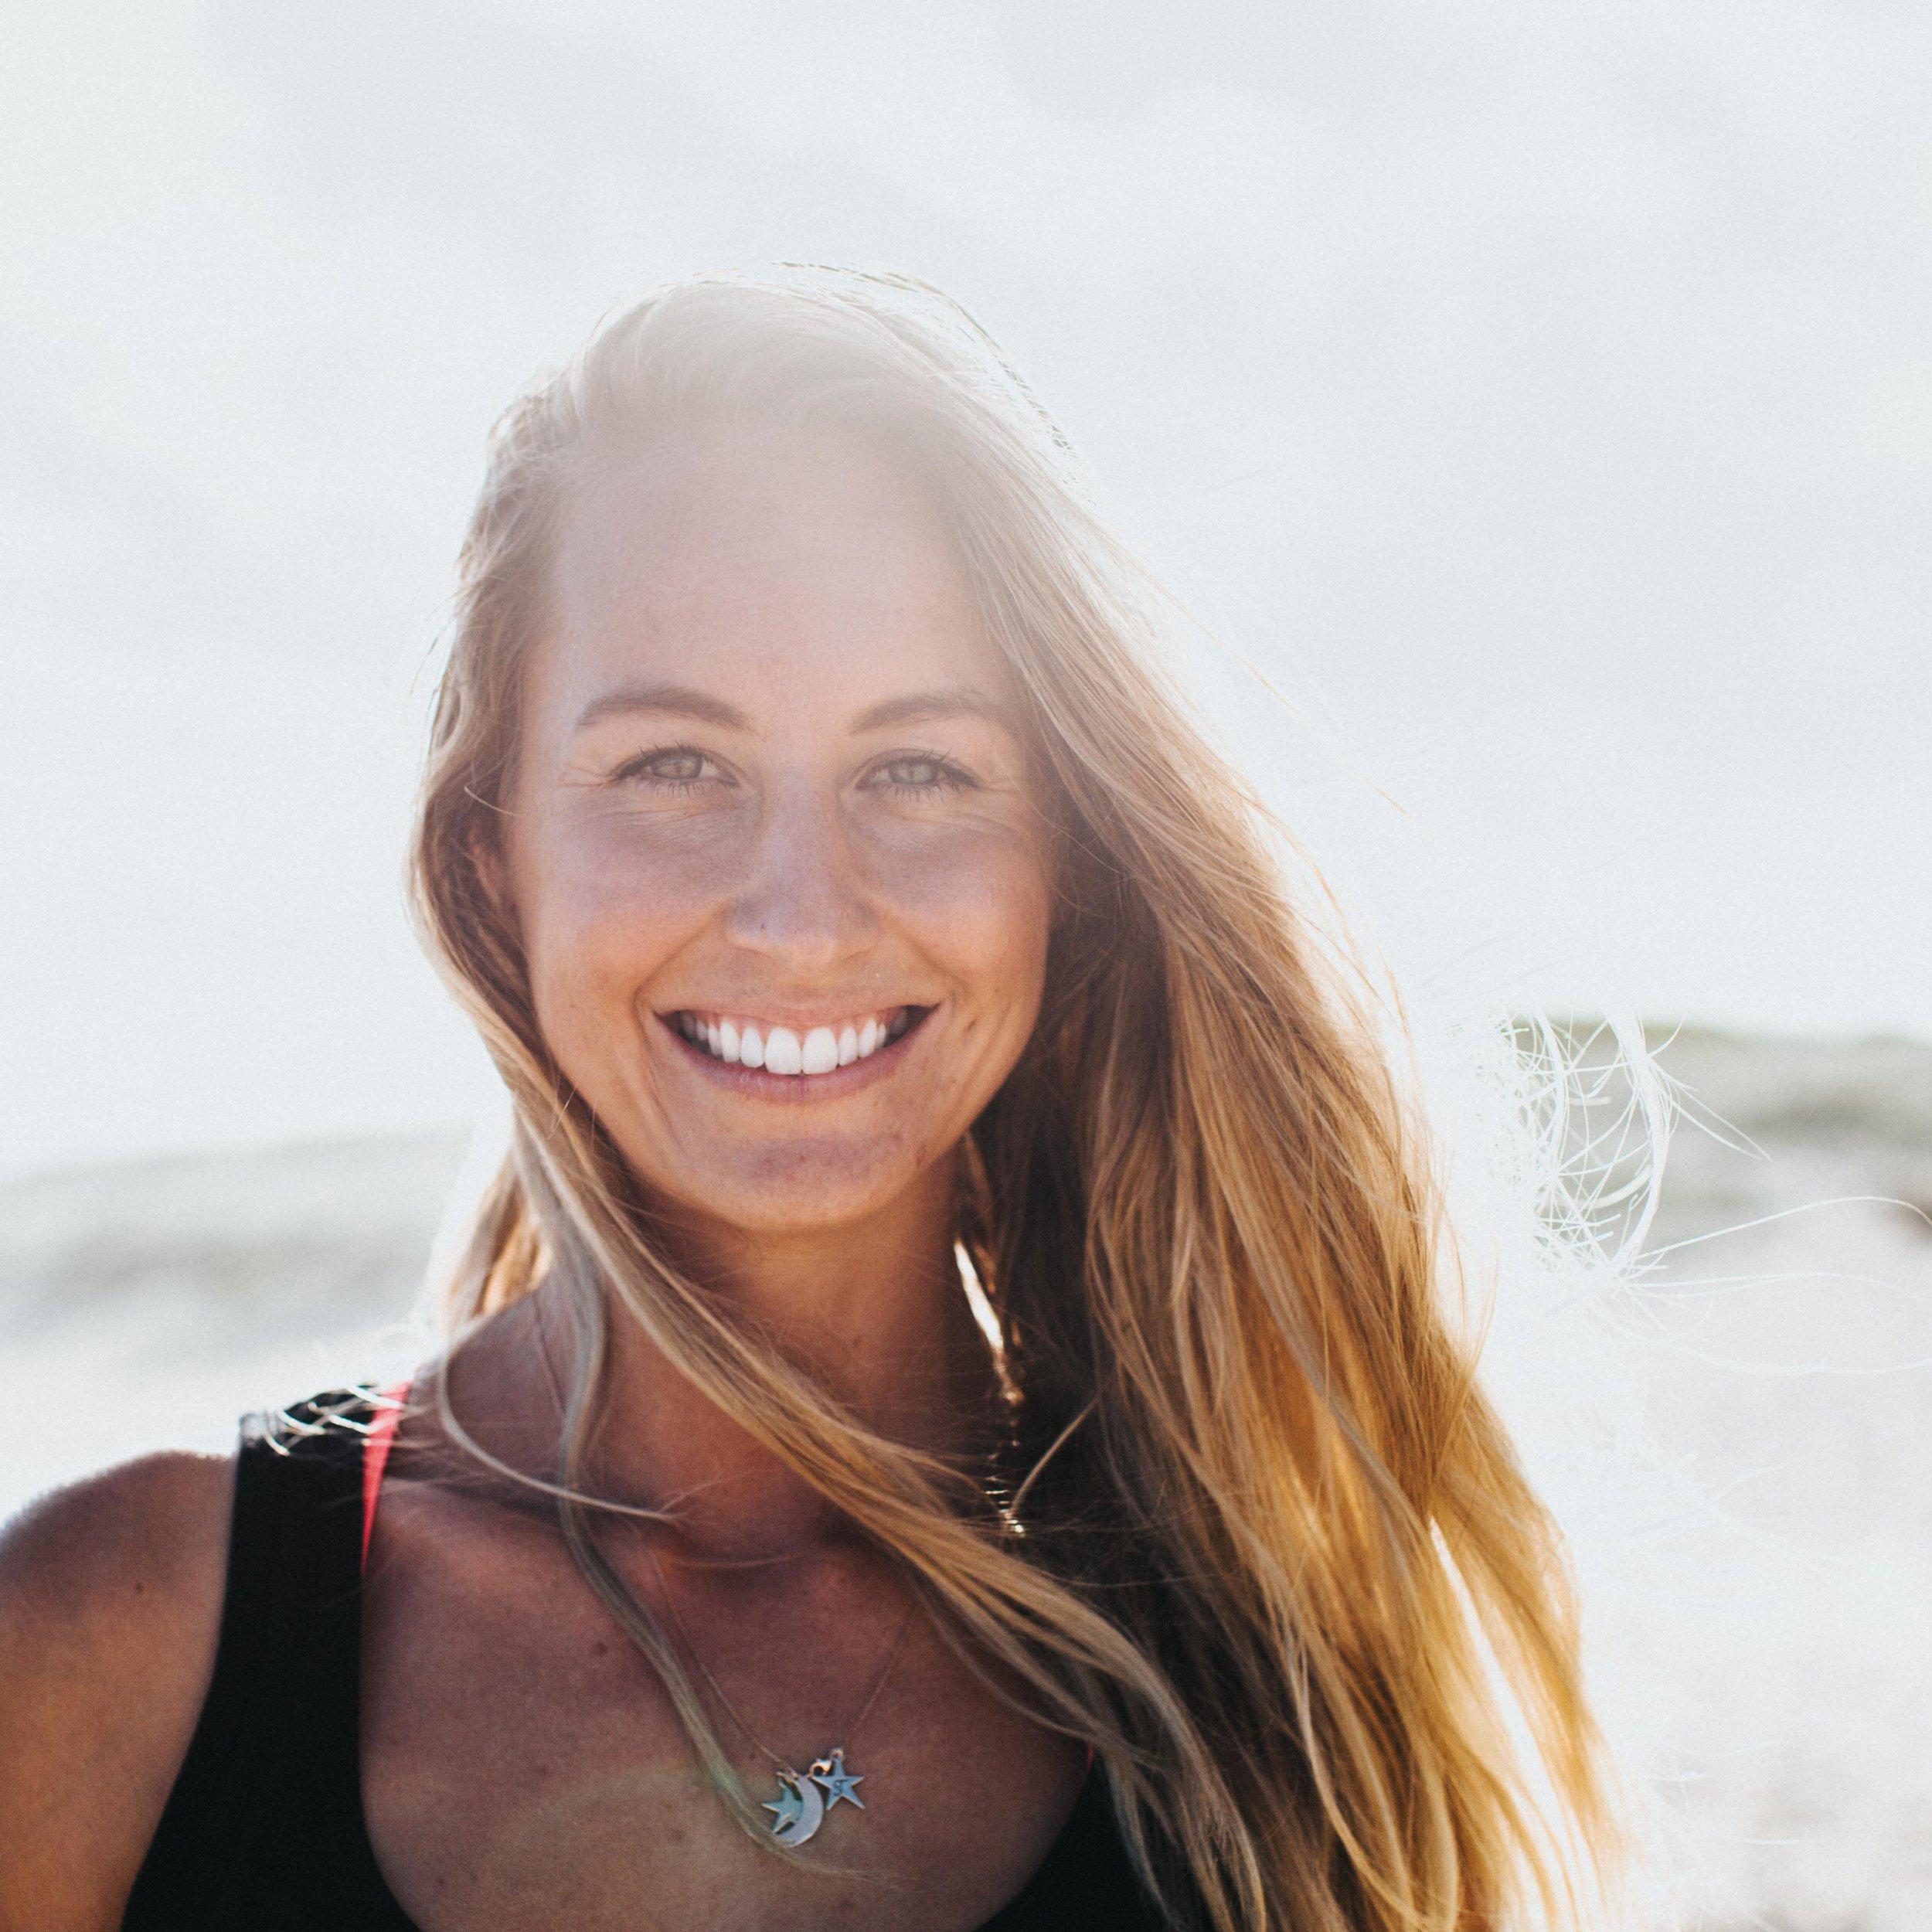 CASEY CORDOBA - Co Creator of H.E.L.P | Yoga,Movement + Breathe CoachSERVICES OFFERED:Yoga +MeditationYoga NidraBreath WorkKids Yoga + Mindset Coaching